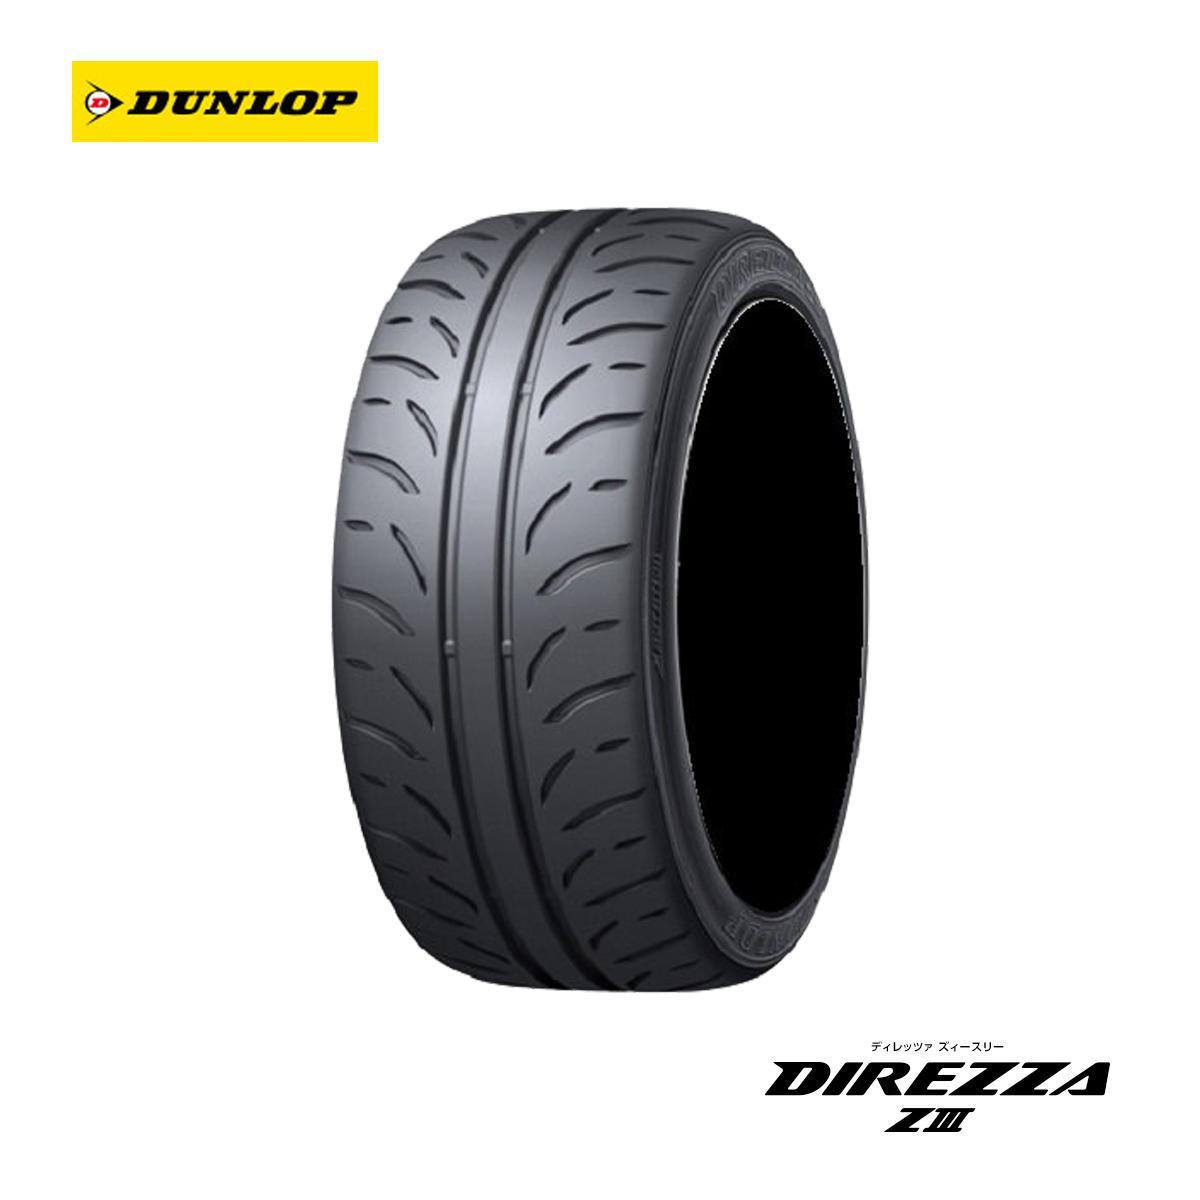 DUNLOP ダンロップ サマータイヤ 2本 16インチ 205/50R16 DIREZZA Z3 ディレッツァ